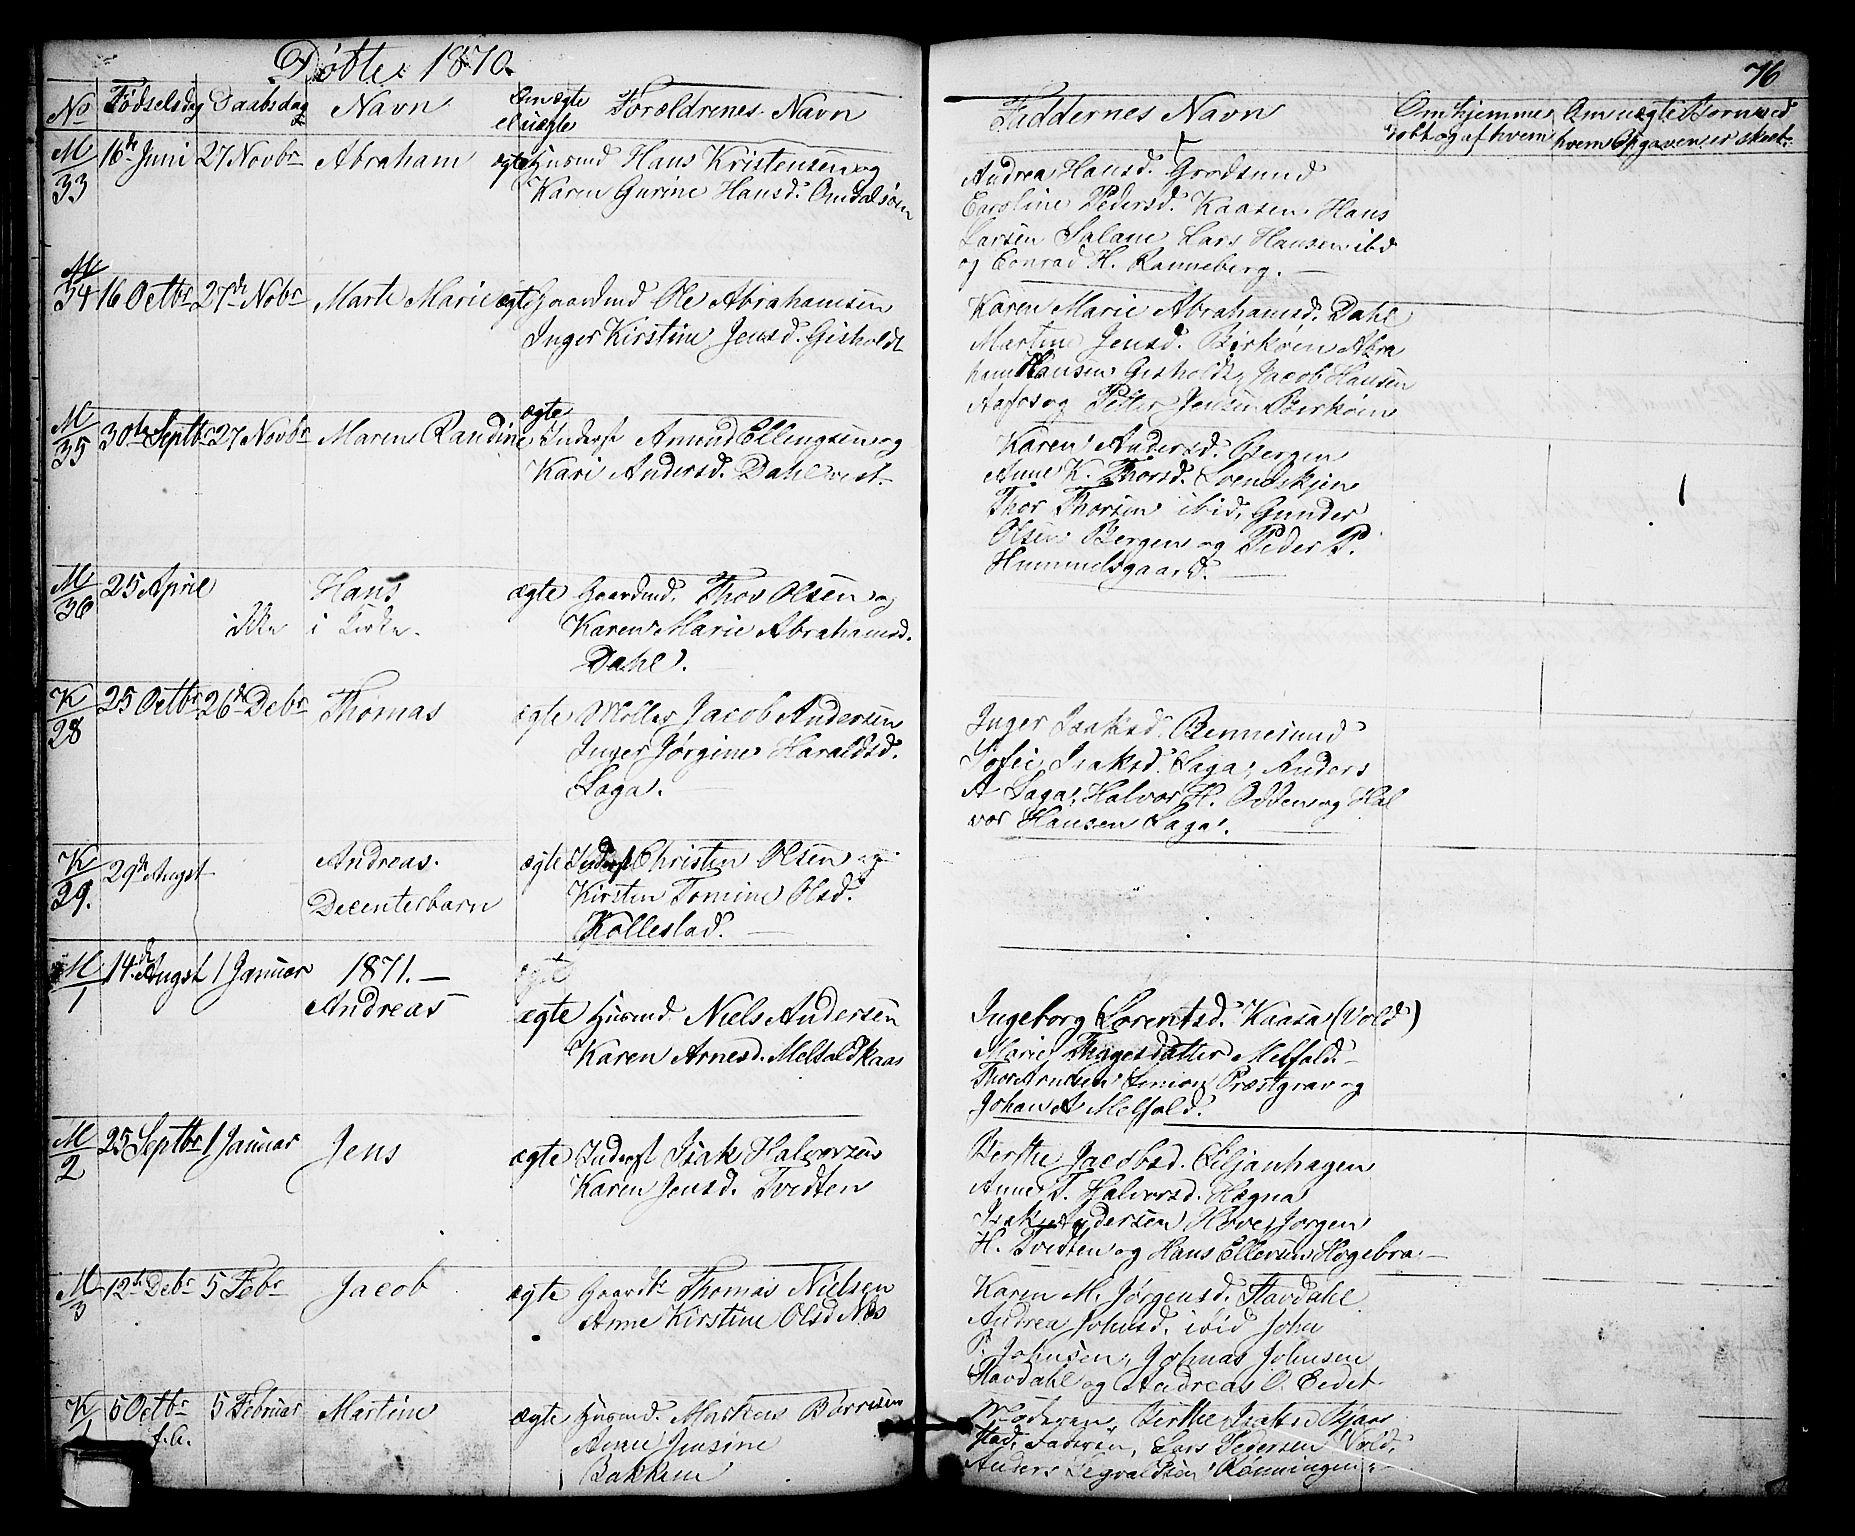 SAKO, Solum kirkebøker, G/Gb/L0002: Klokkerbok nr. II 2, 1859-1879, s. 76